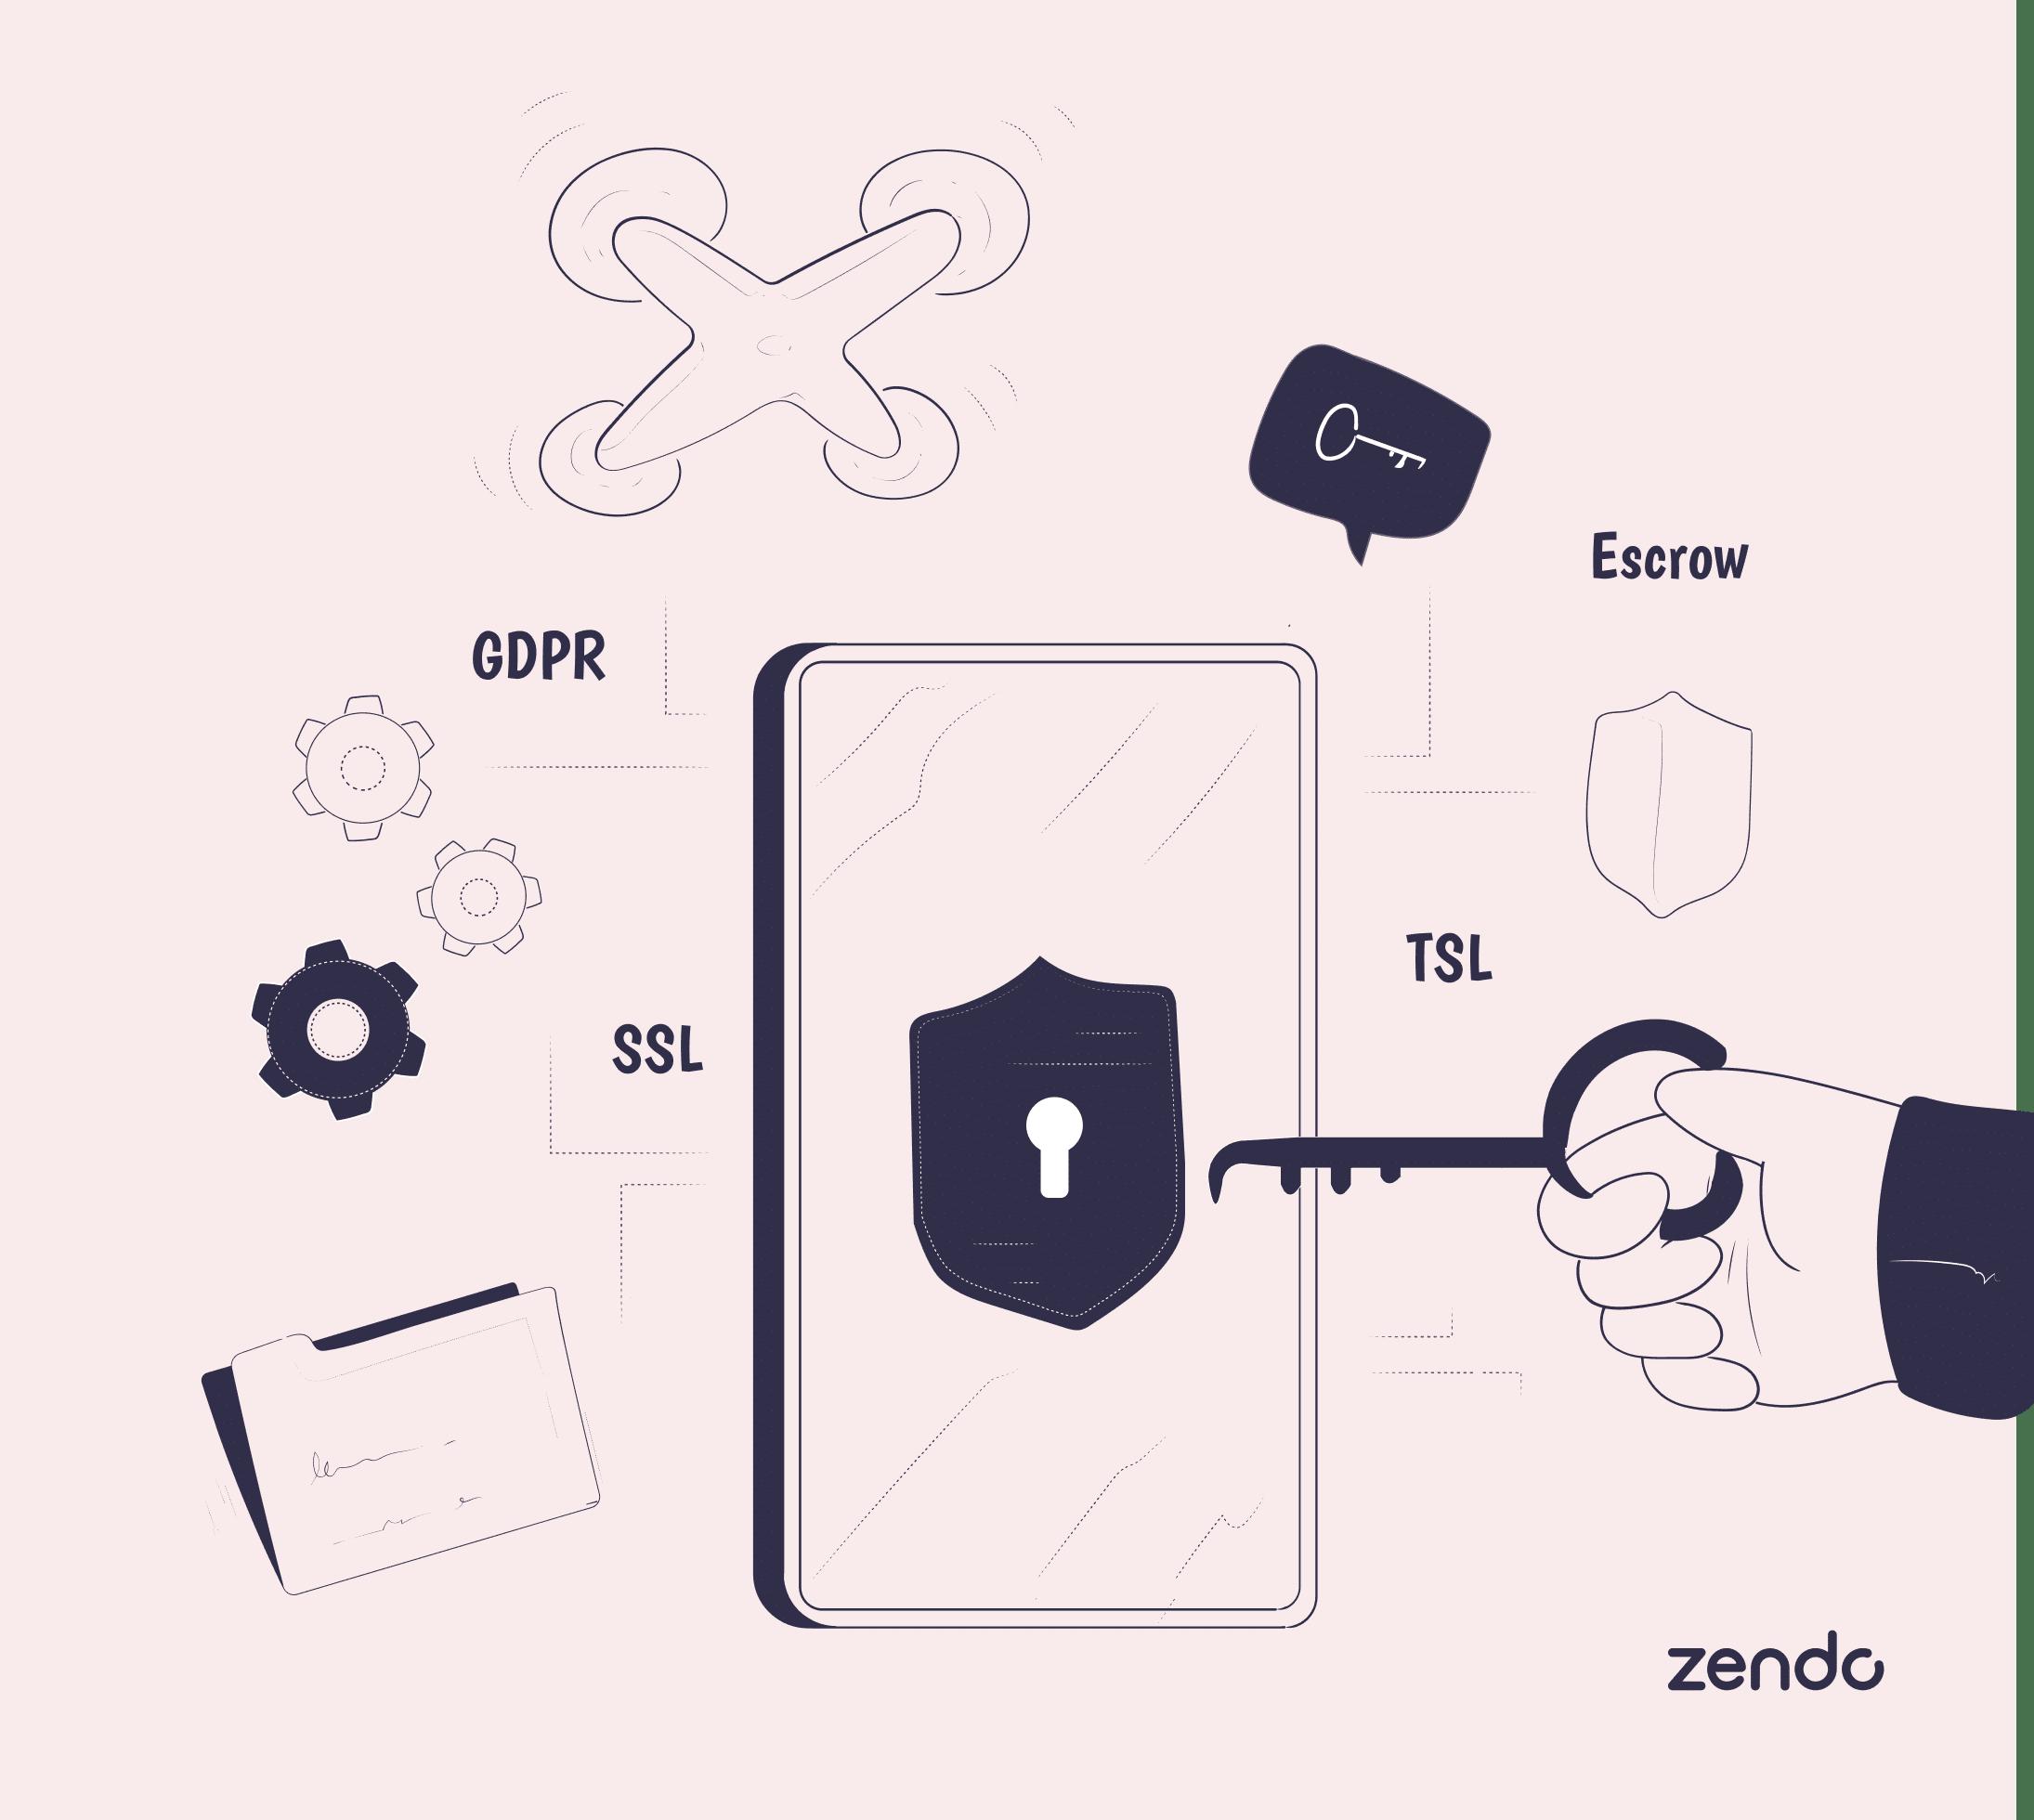 Illustration showing Upwork's security: Escrow, SSL, TSL, GDPR.